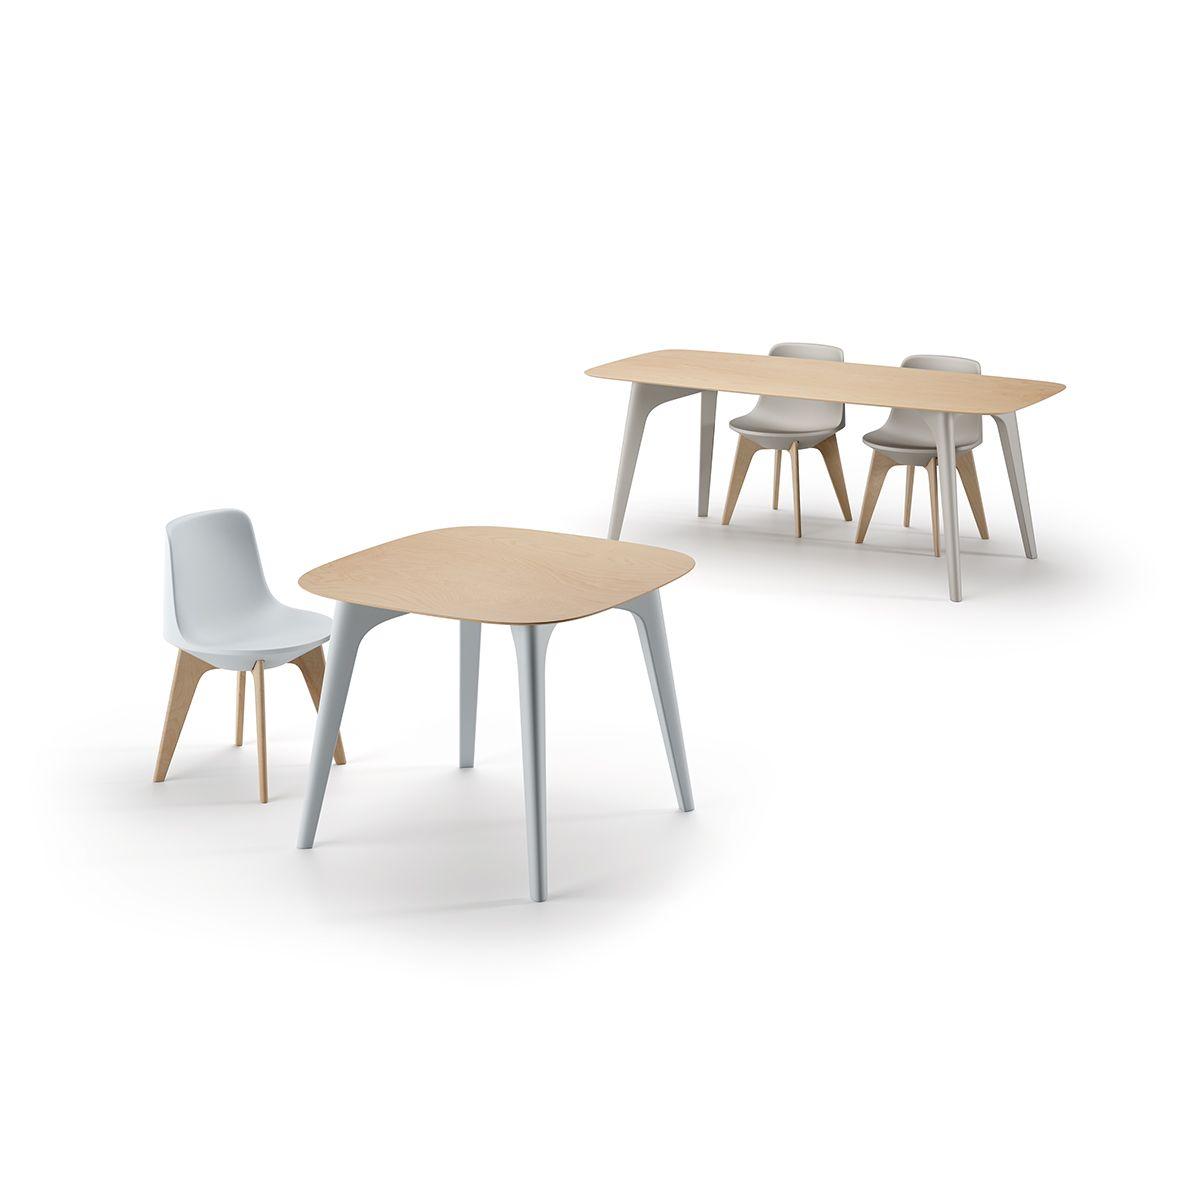 Sedie e tavoli per indoor/outdoor